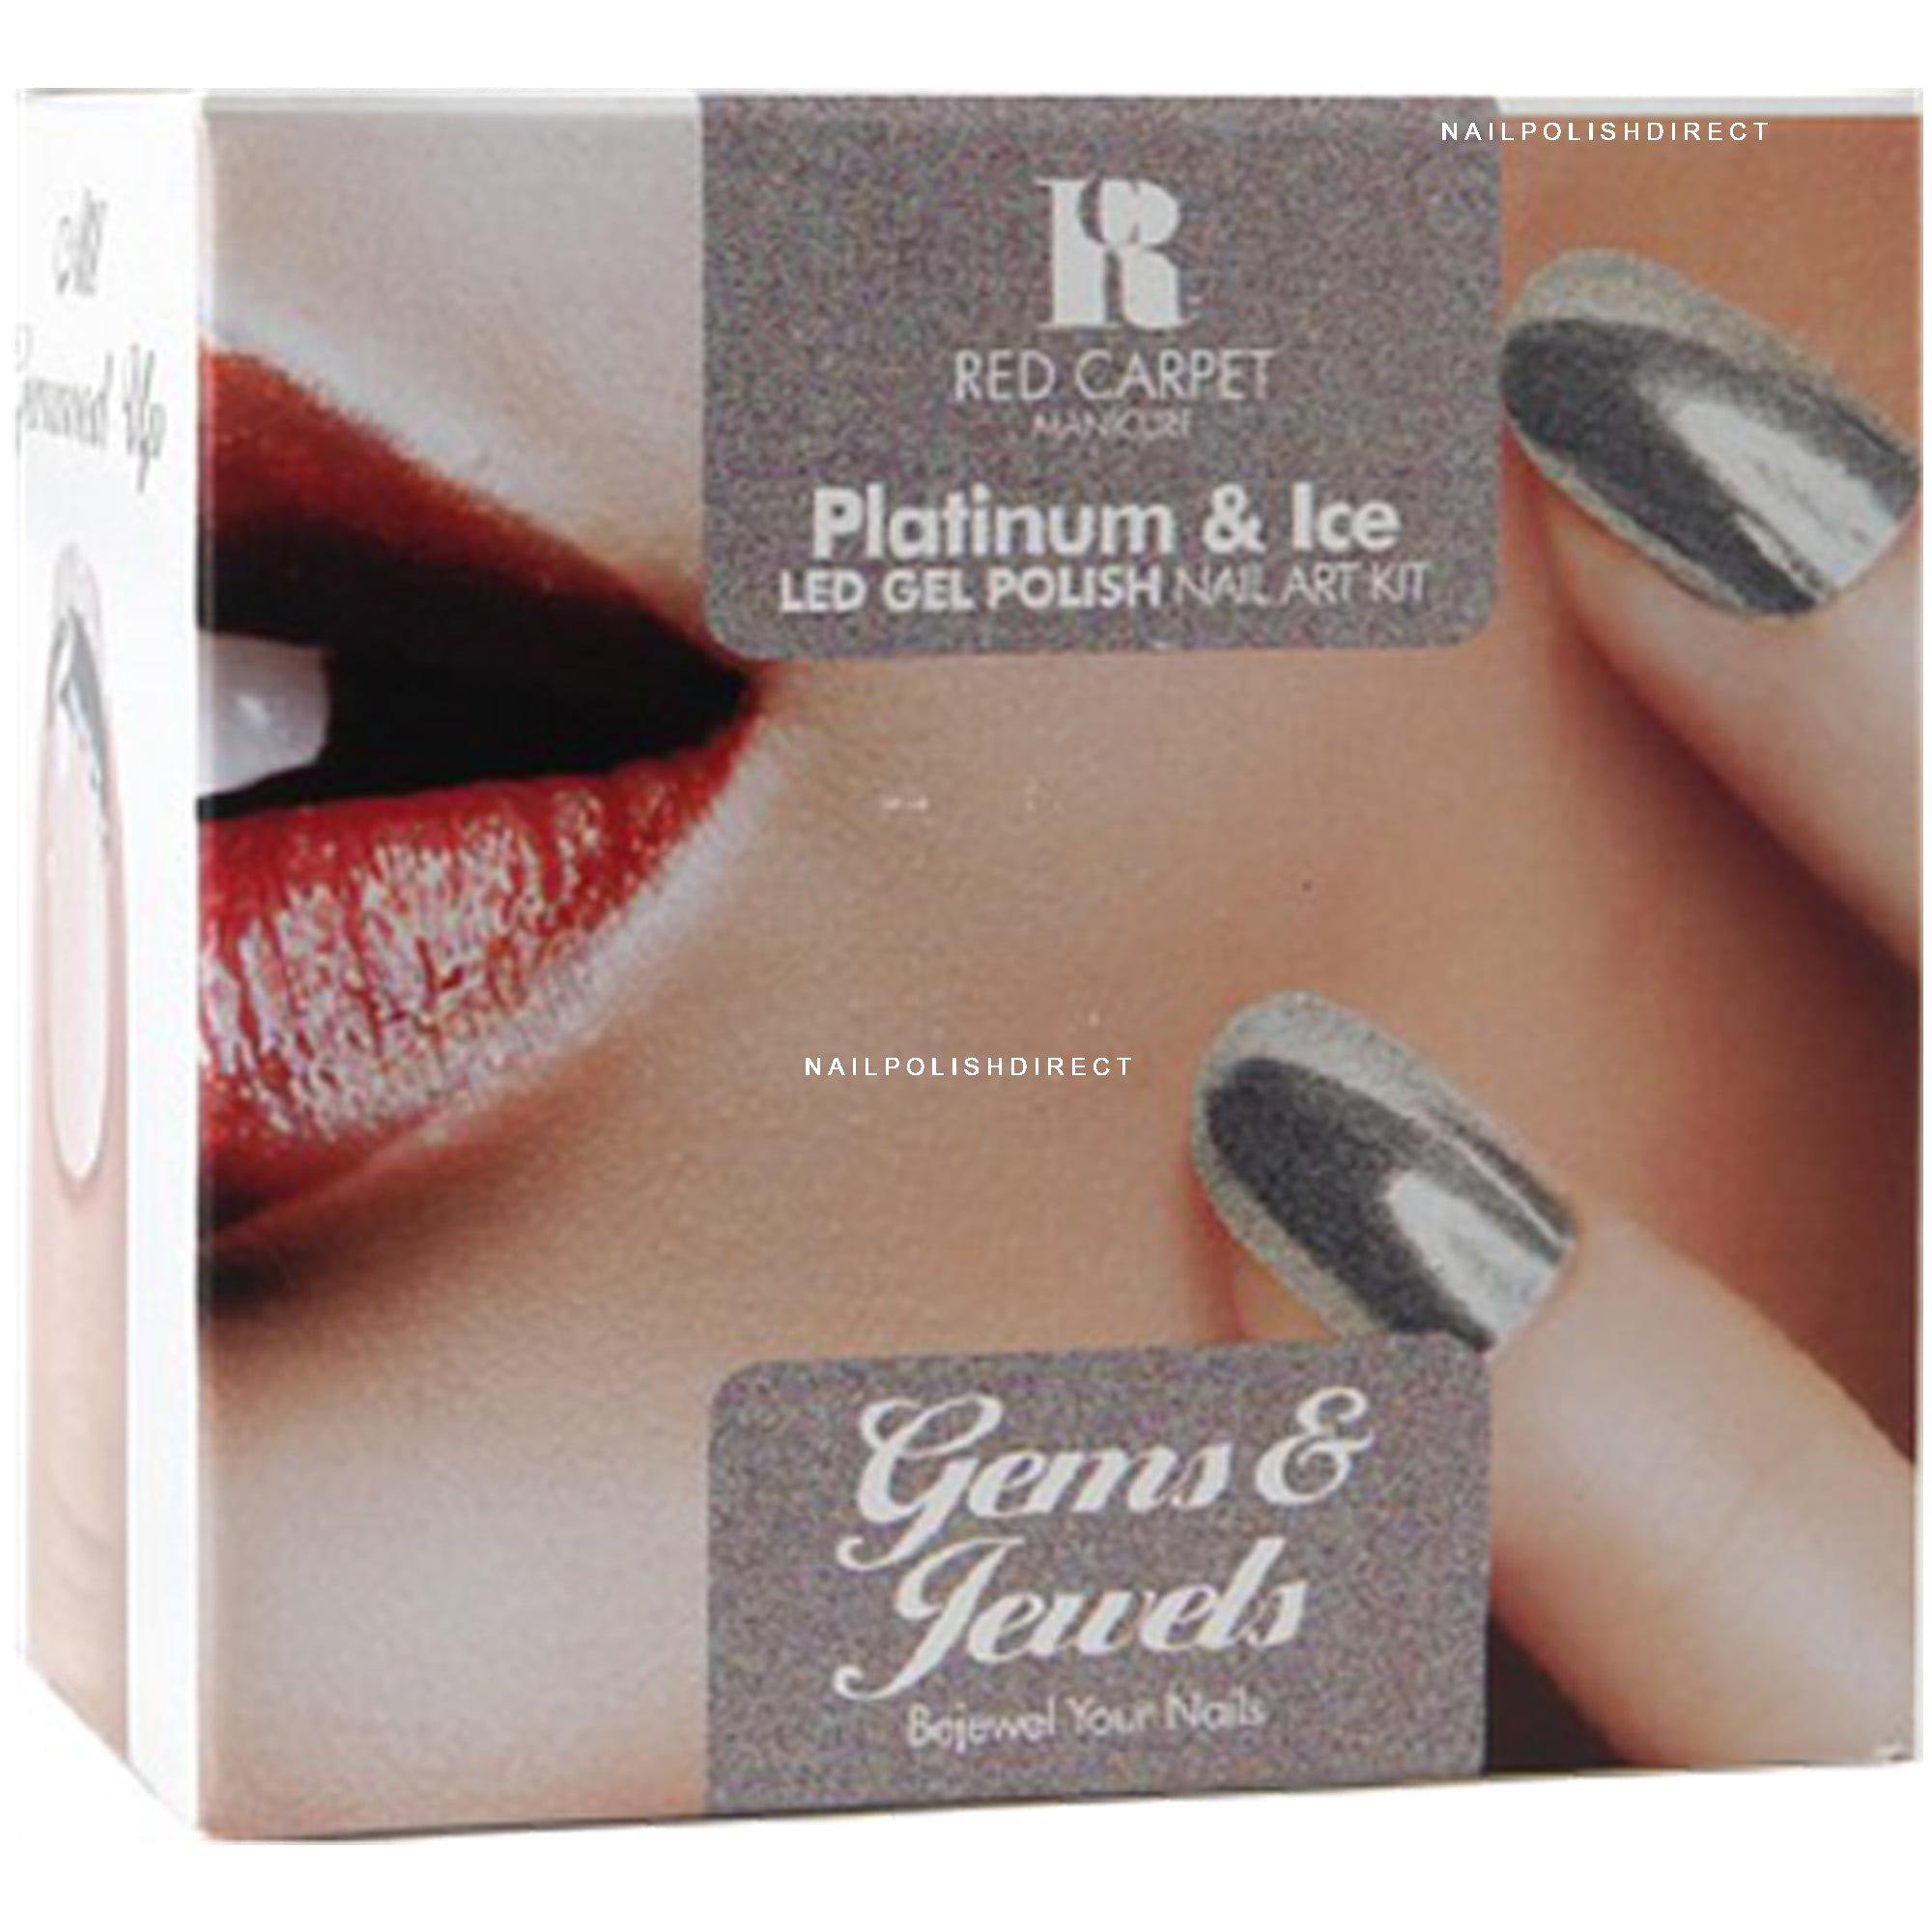 Red Carpet Manicure - Gems & Jewels Platinum & Ice Kit (x9 Piece)